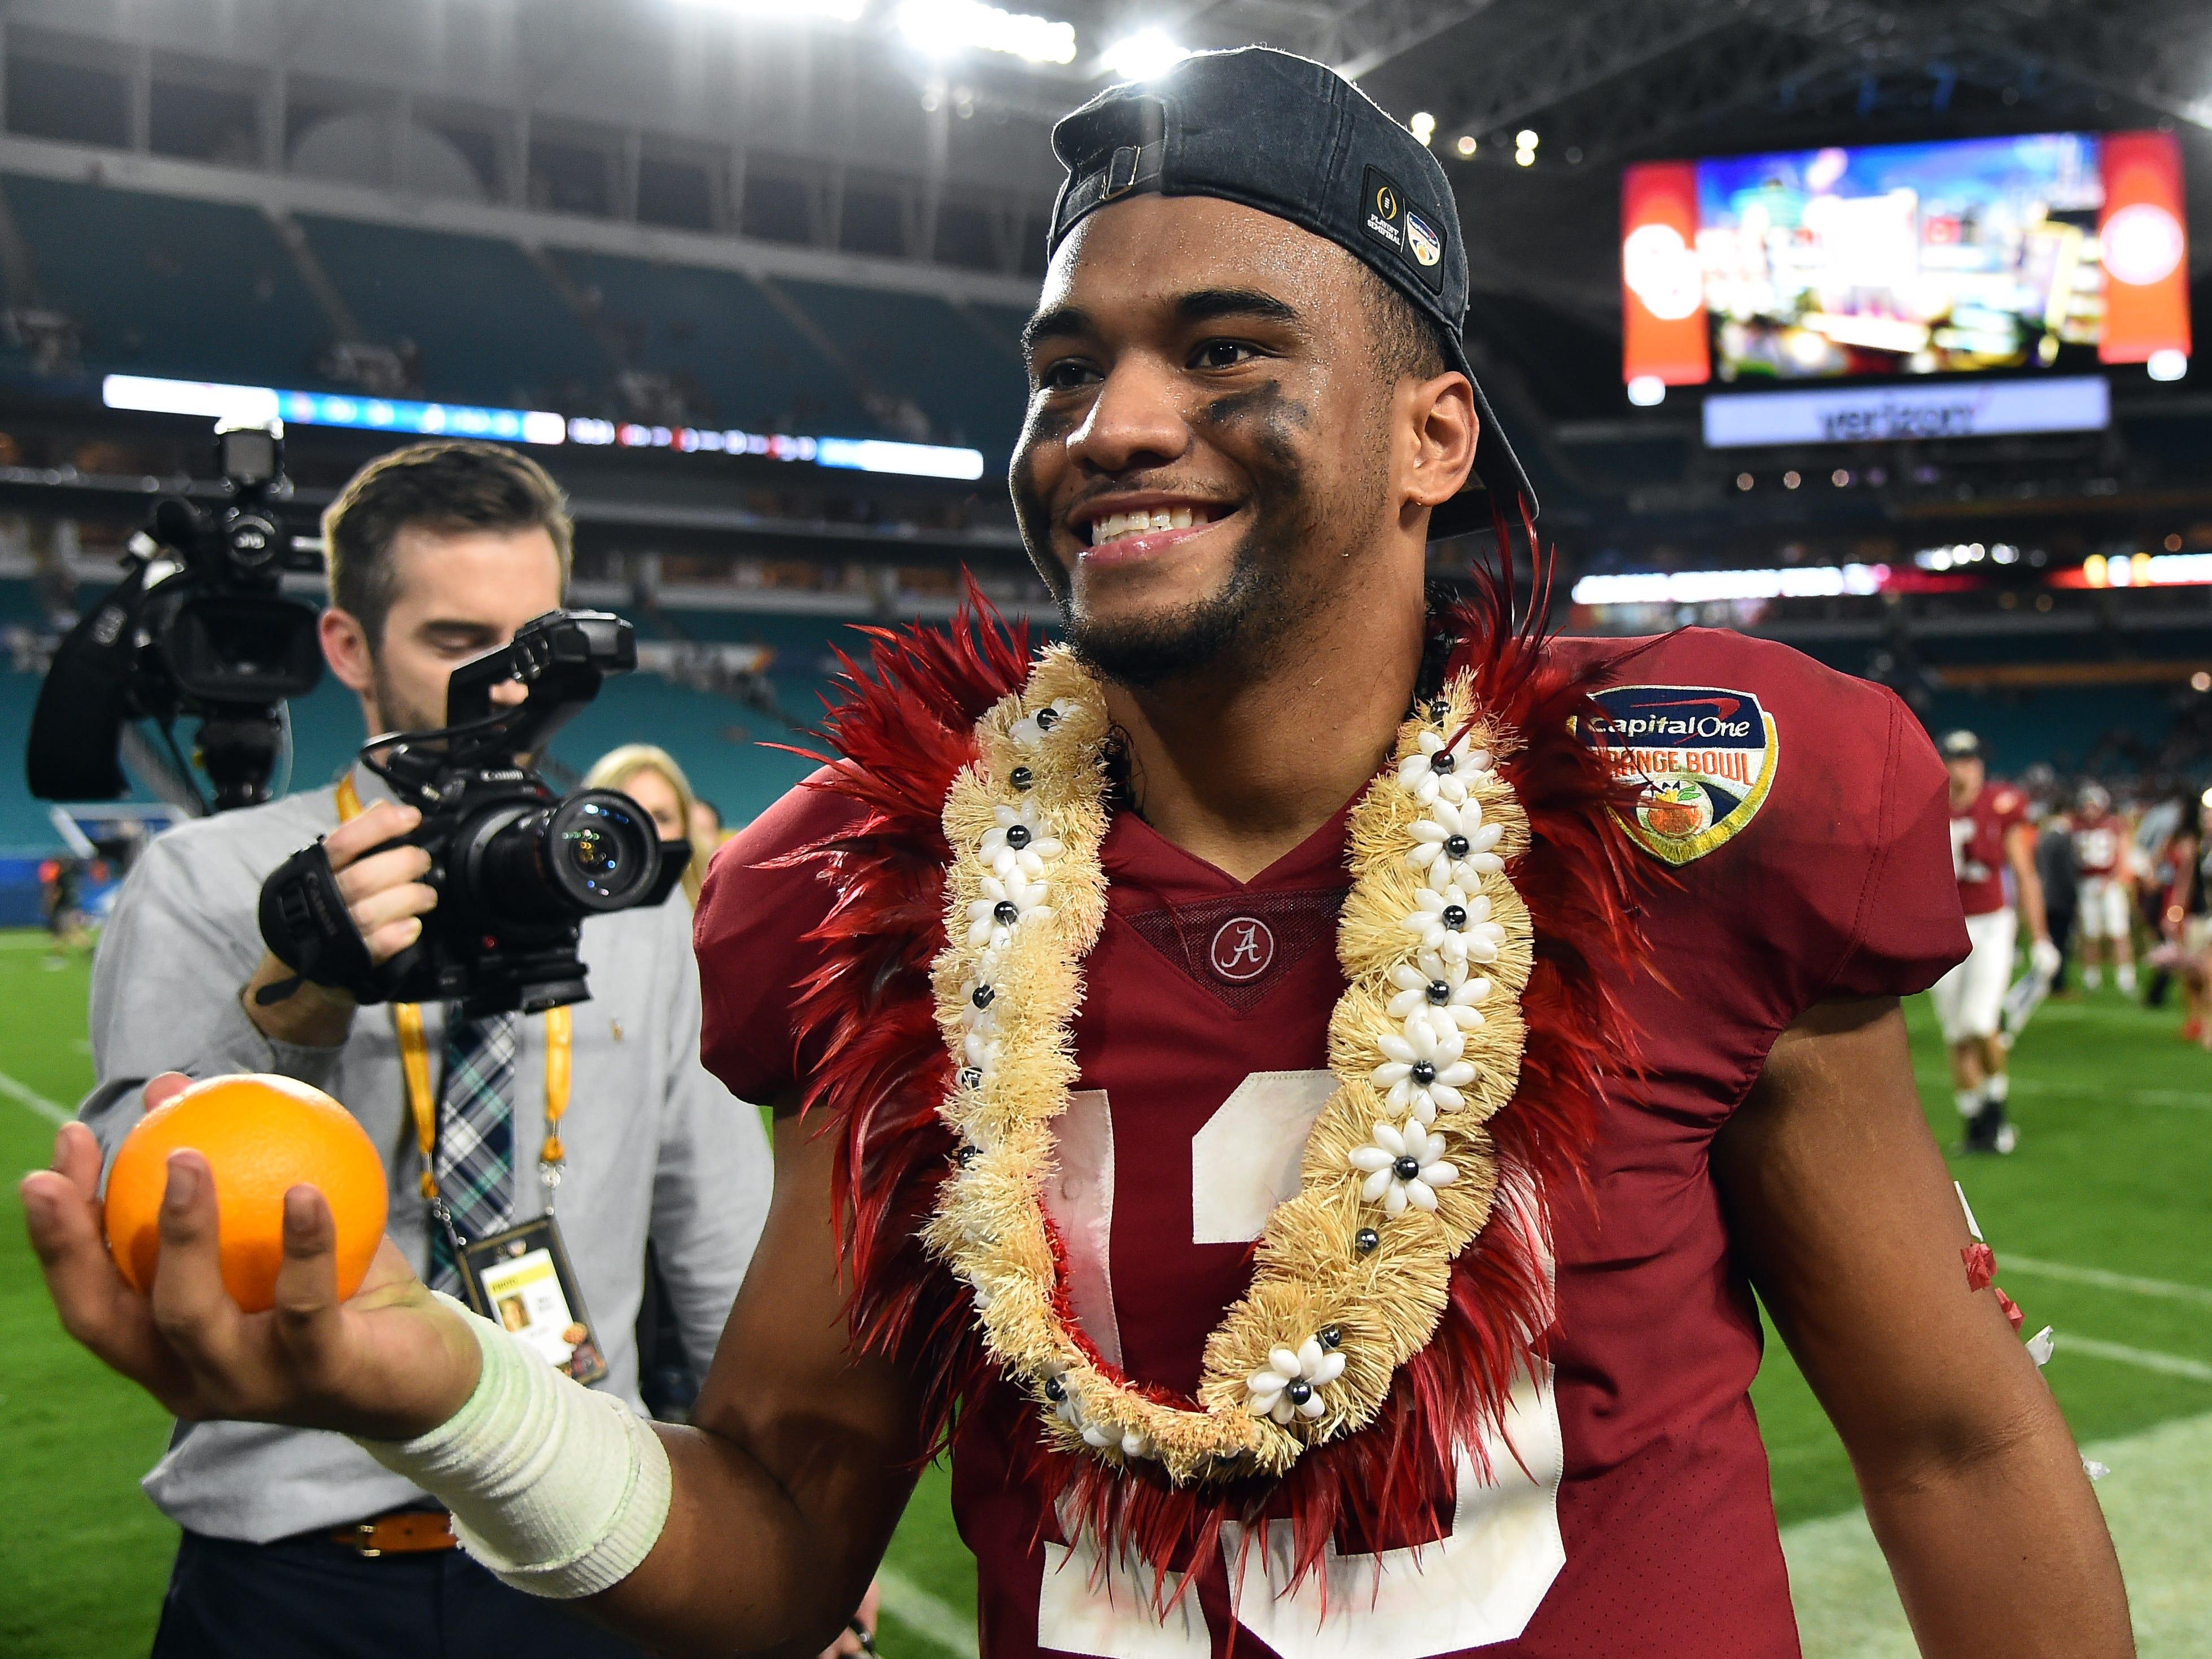 NFL draft 2020's top 10 prospects: Tank for Tua Tagovailoa?